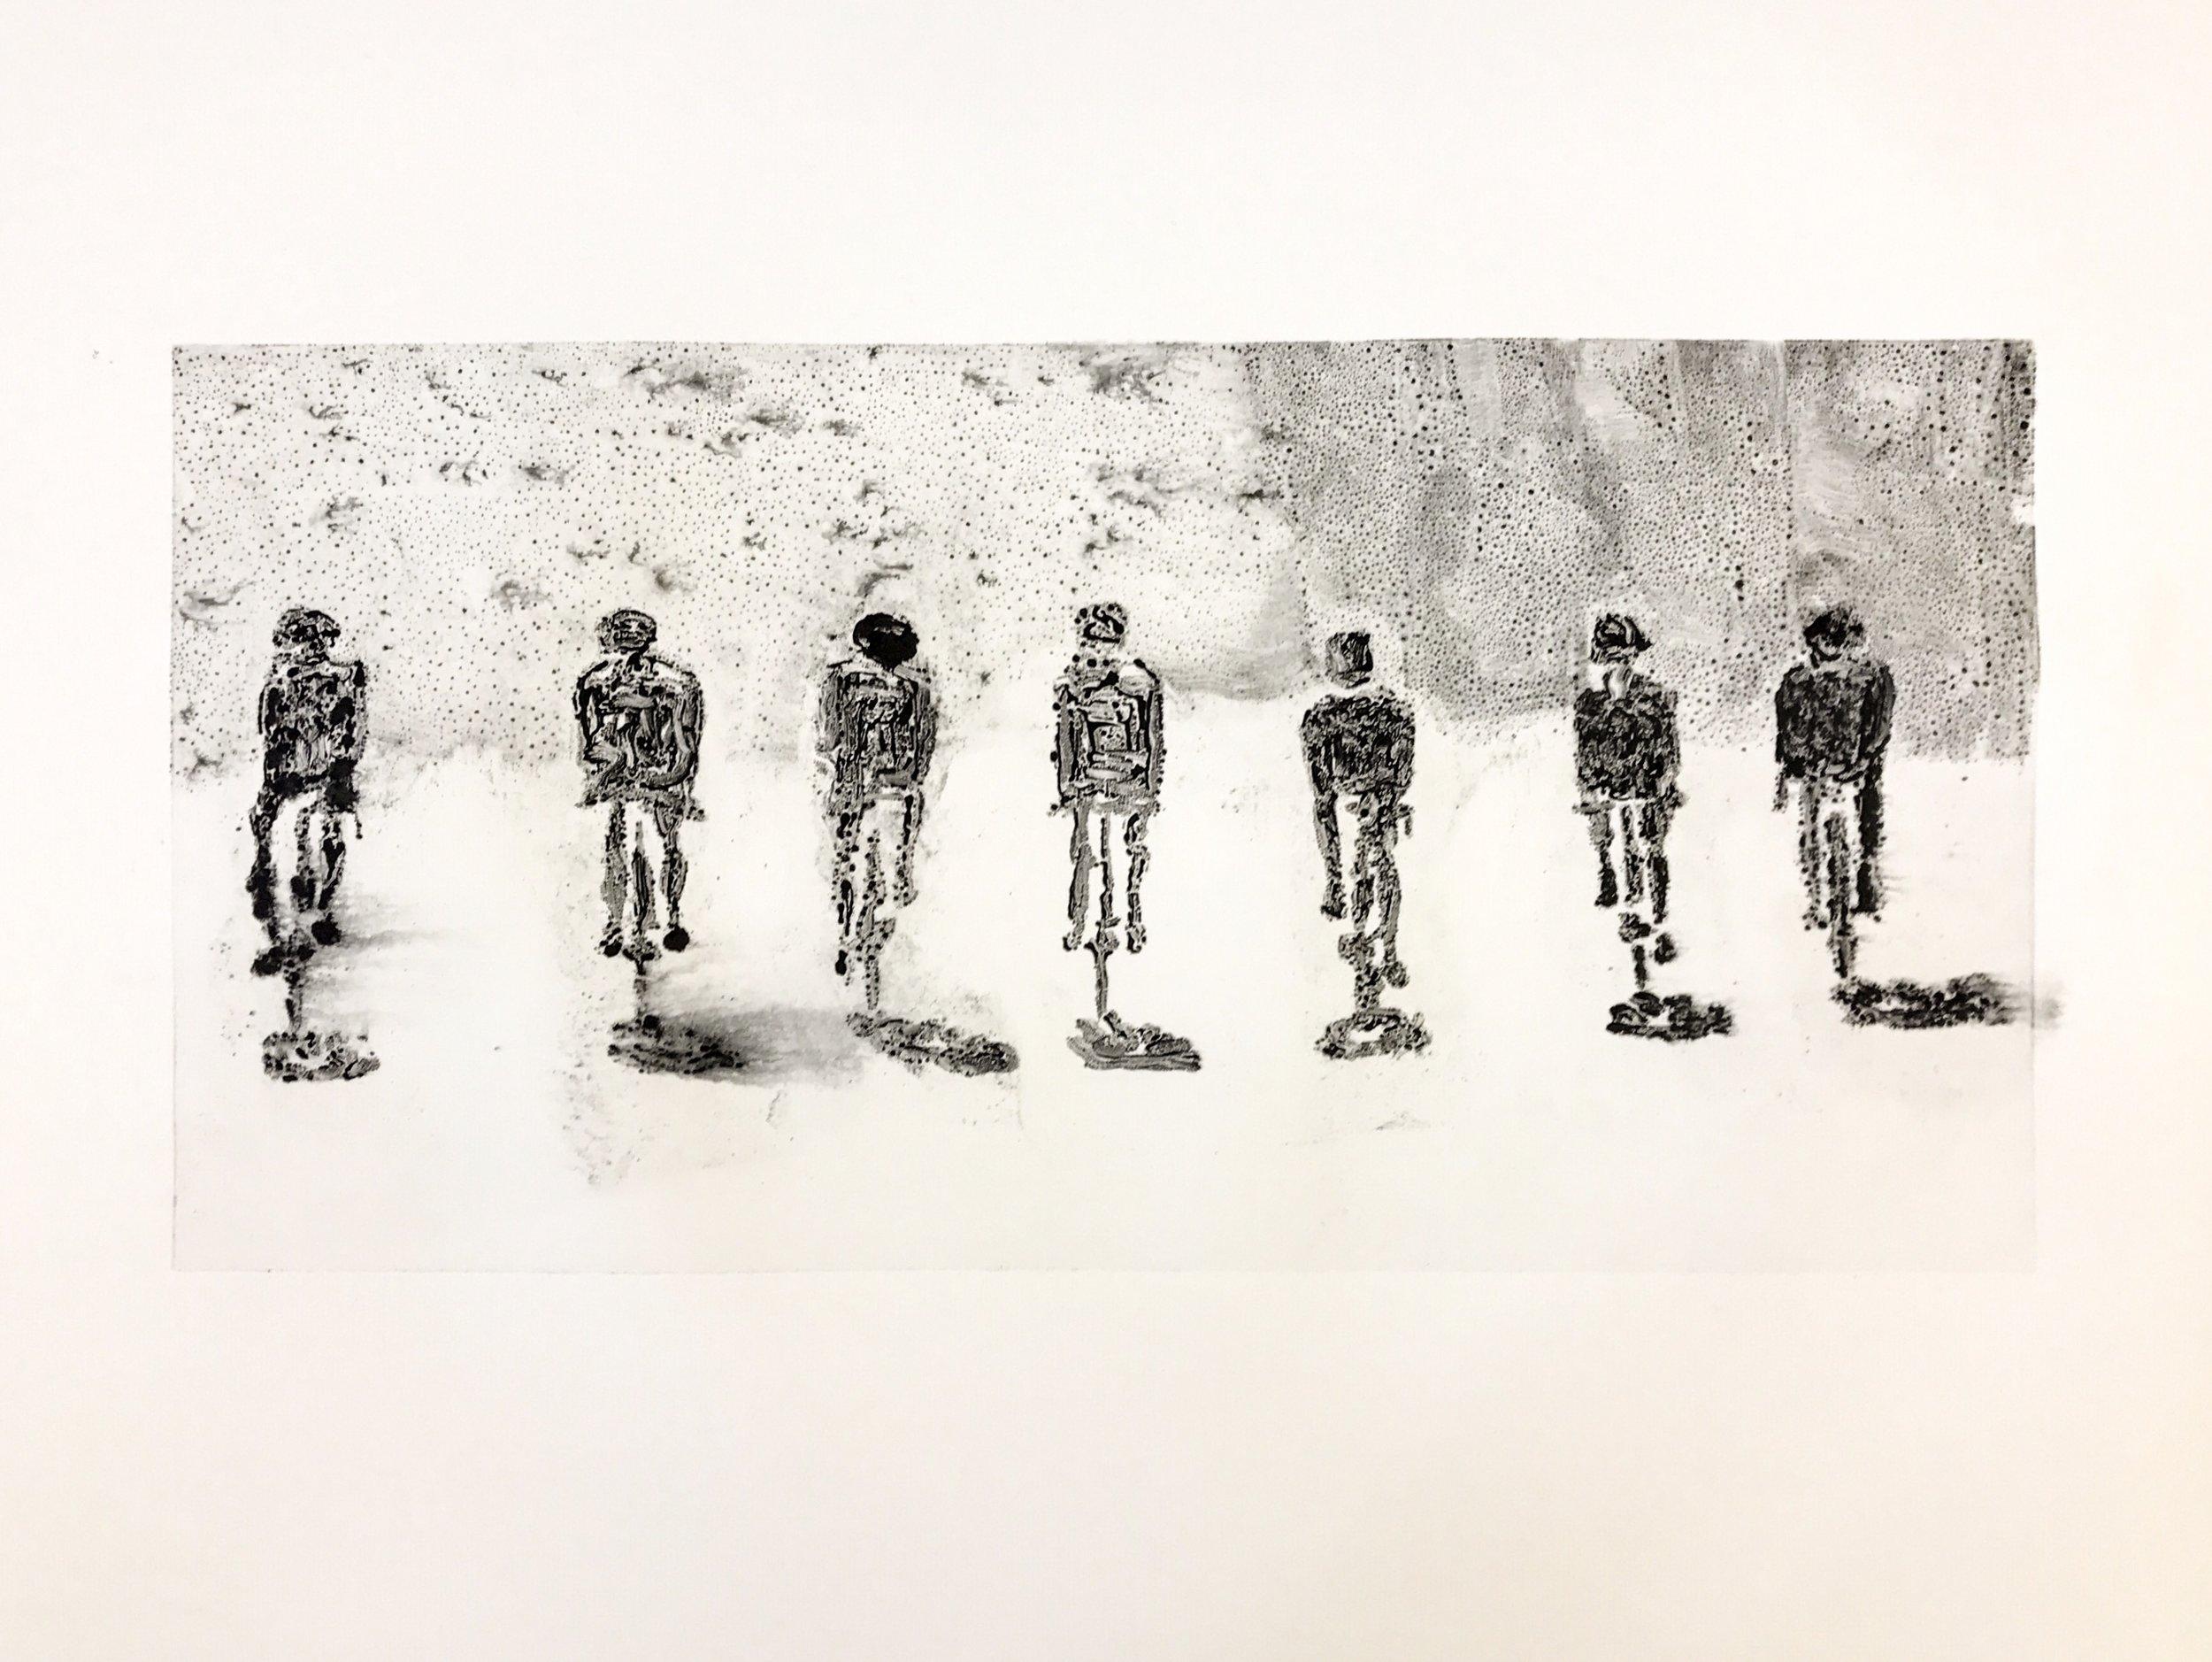 Seven cyclist